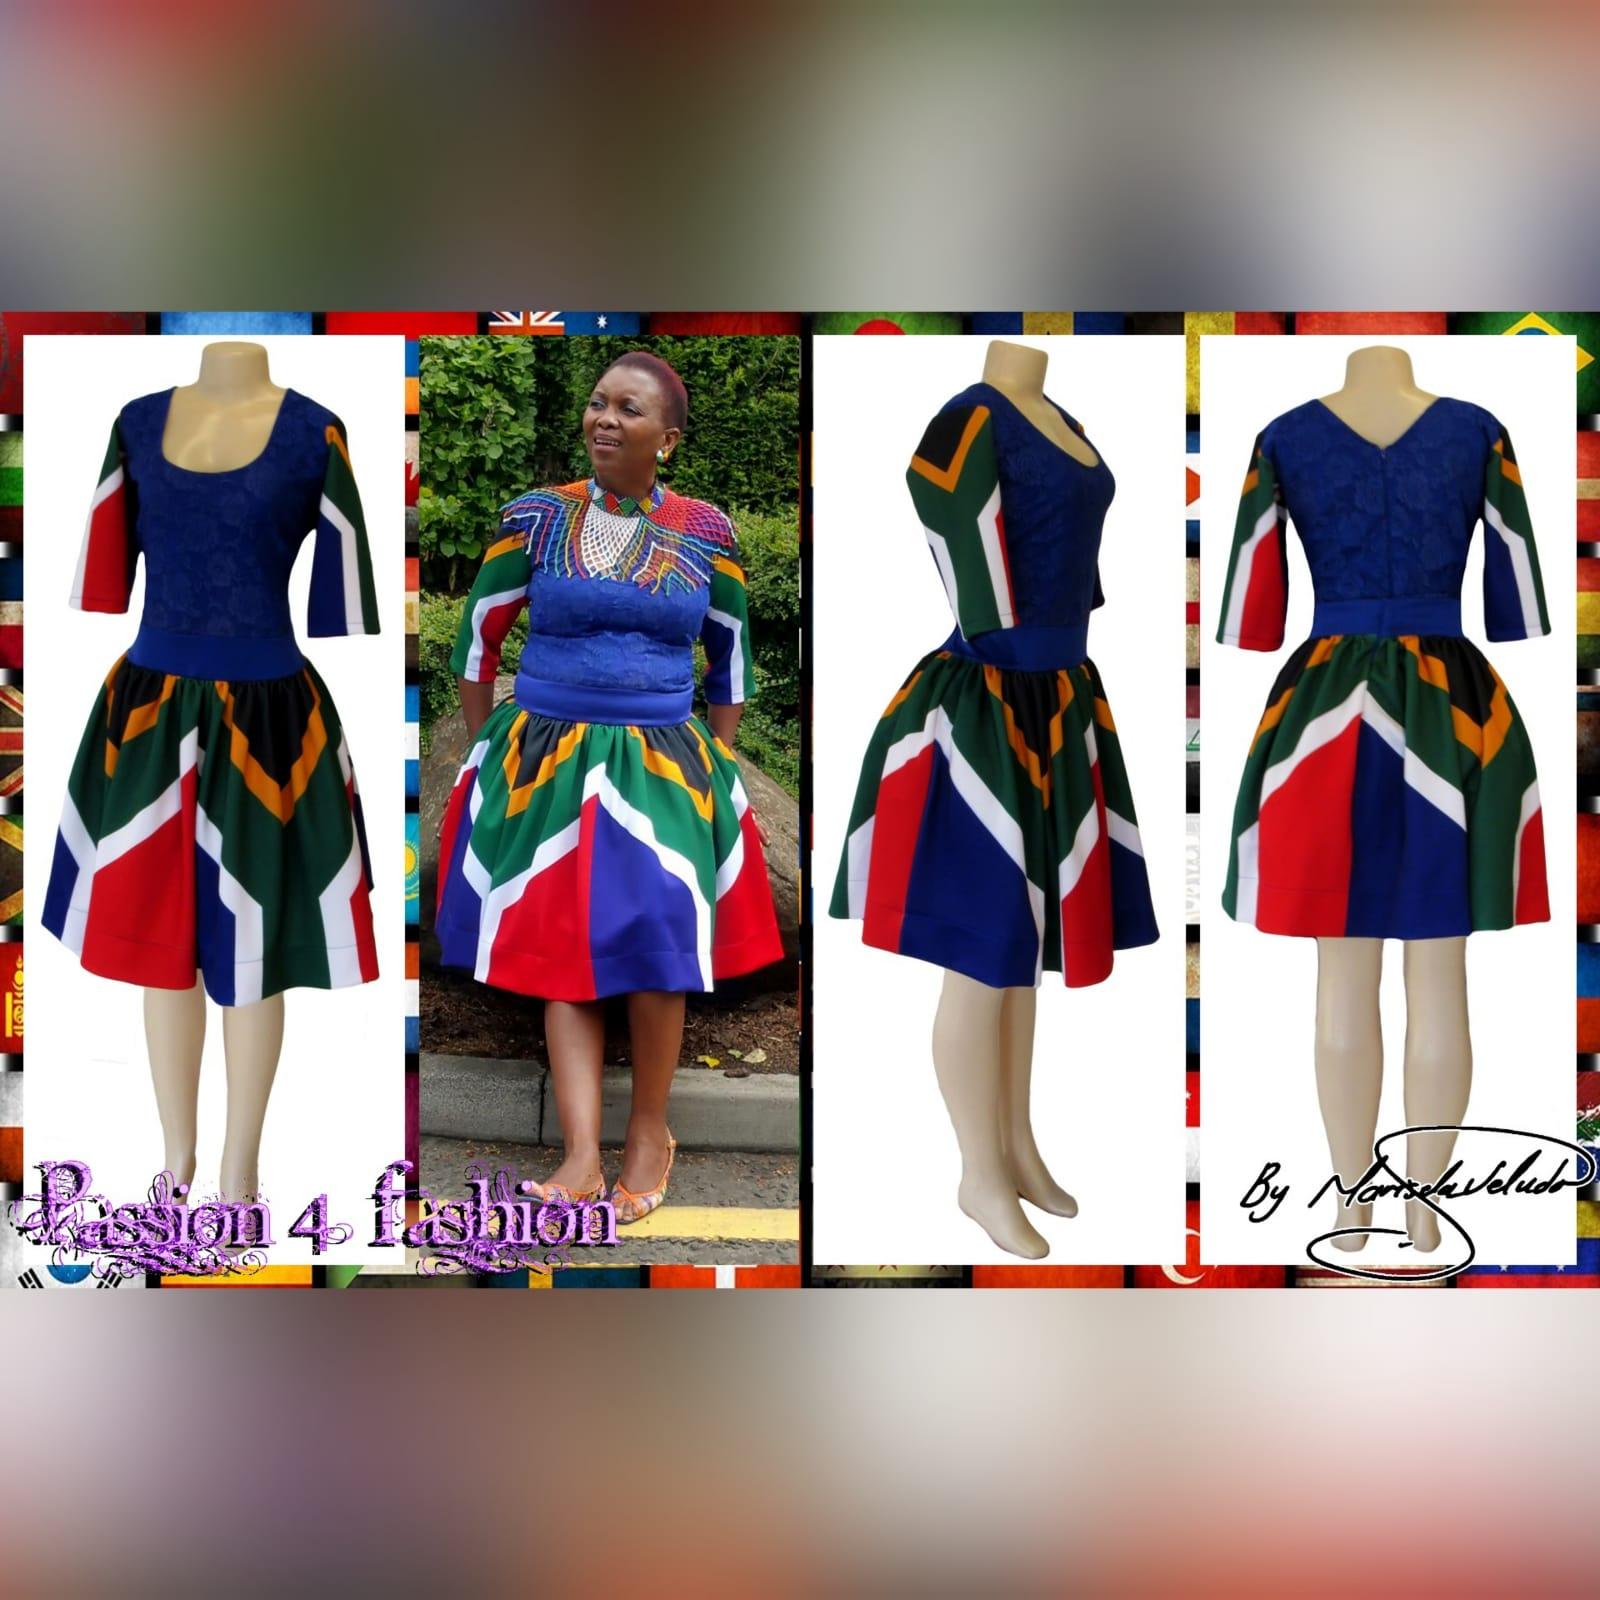 Royal blue sa flag short traditional dress 3 royal blue sa flag short traditional dress. With sa flag sleeves and a lace bodice. Traditional dress for graduation.